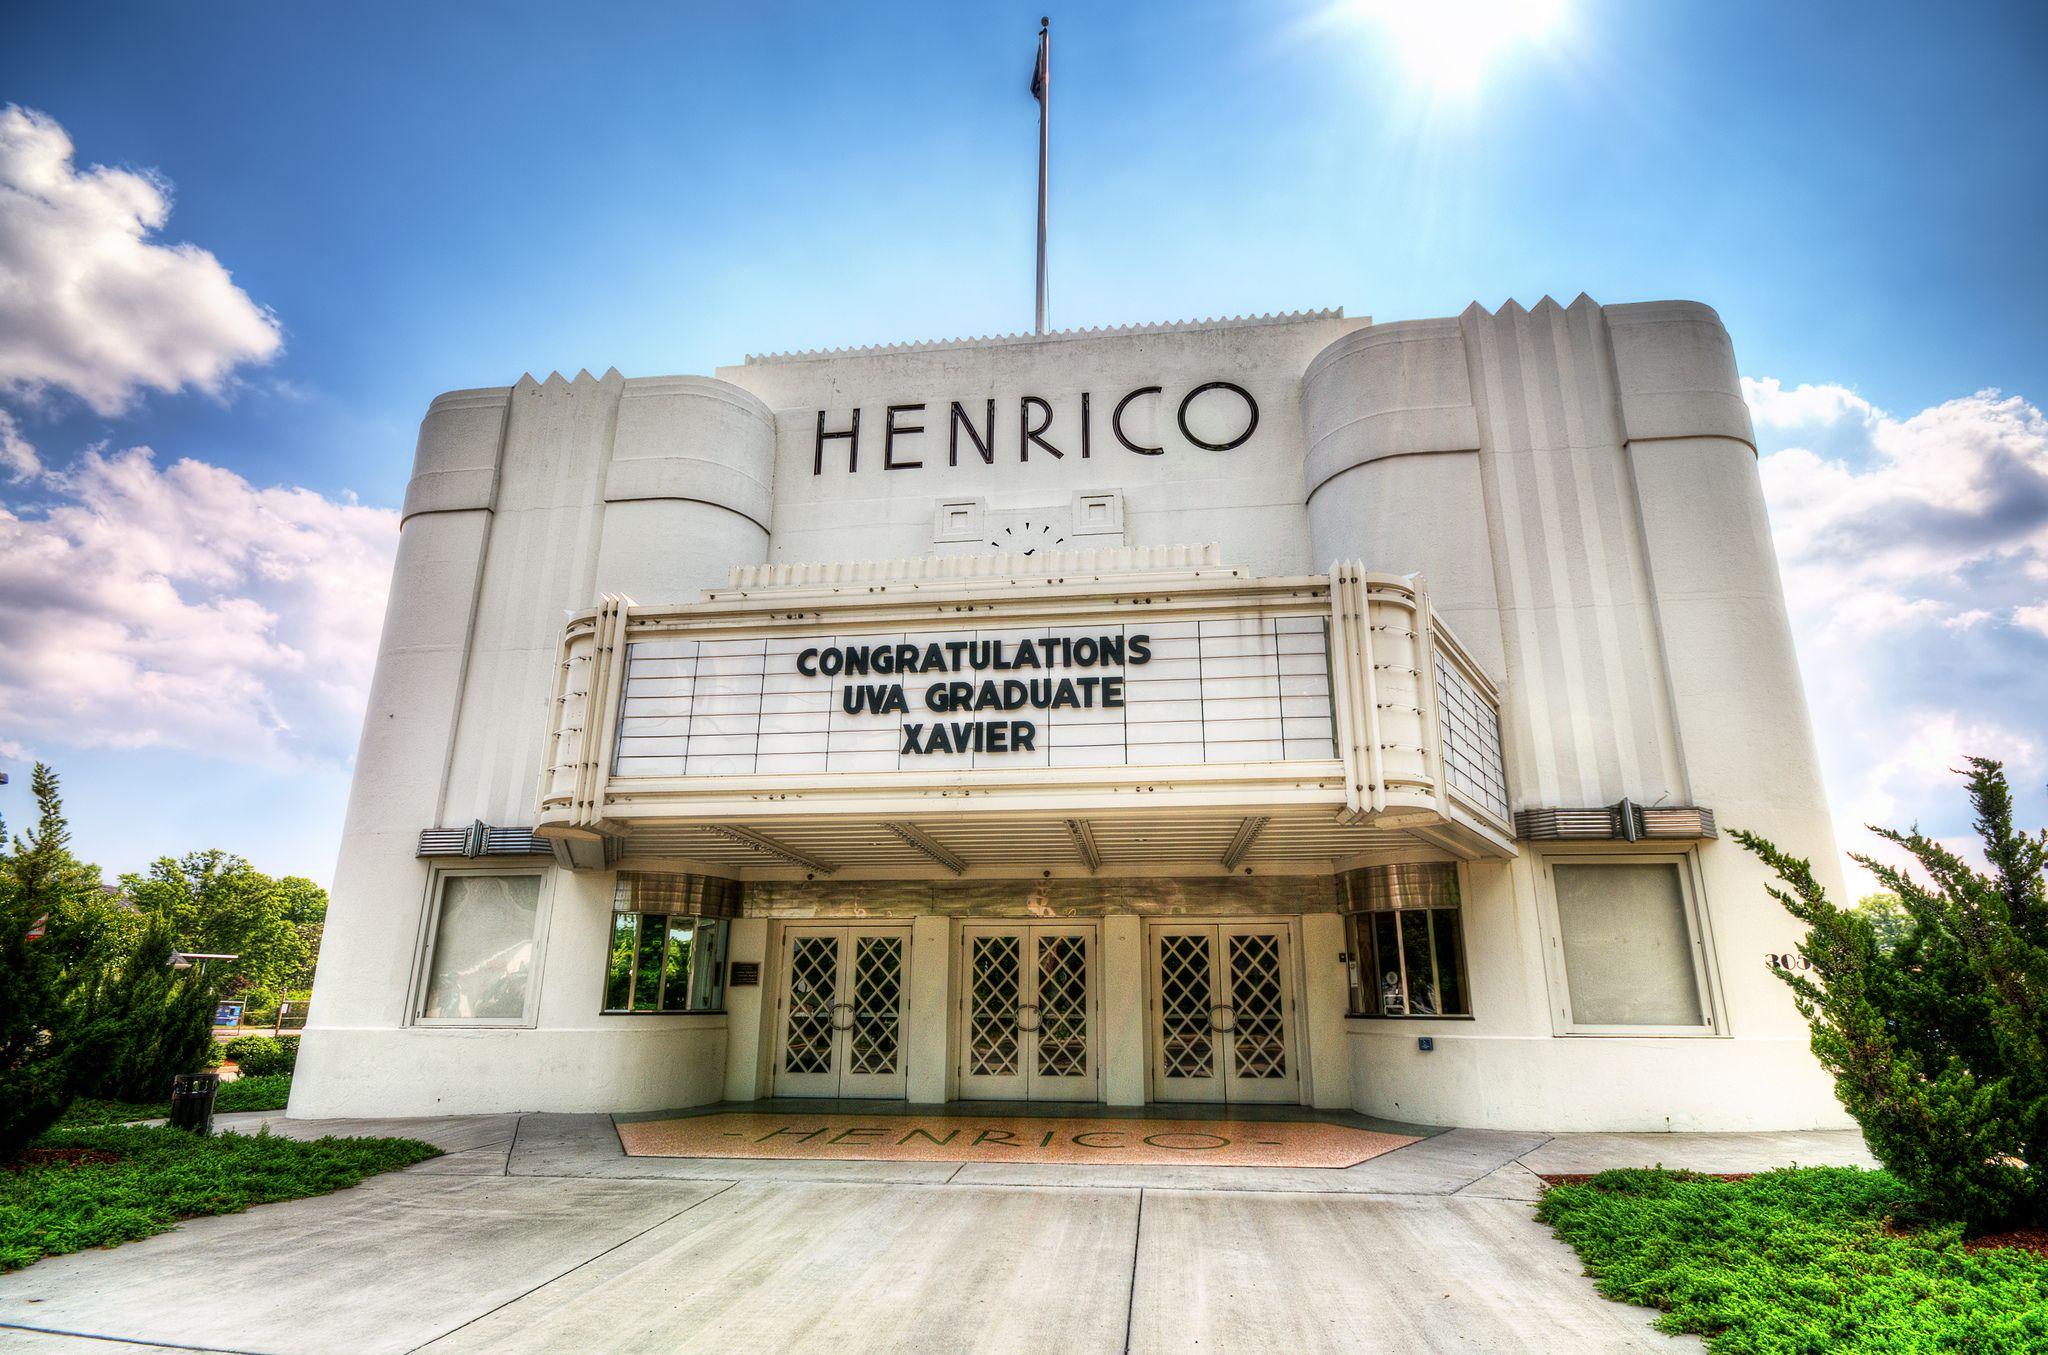 https://flic.kr/p/c8KkS9 | Henrico - art deco theater | Highland Springs, Virginia | The Henrico Theatre was built in 1938, designed by architect Edward Francis Sinnott.